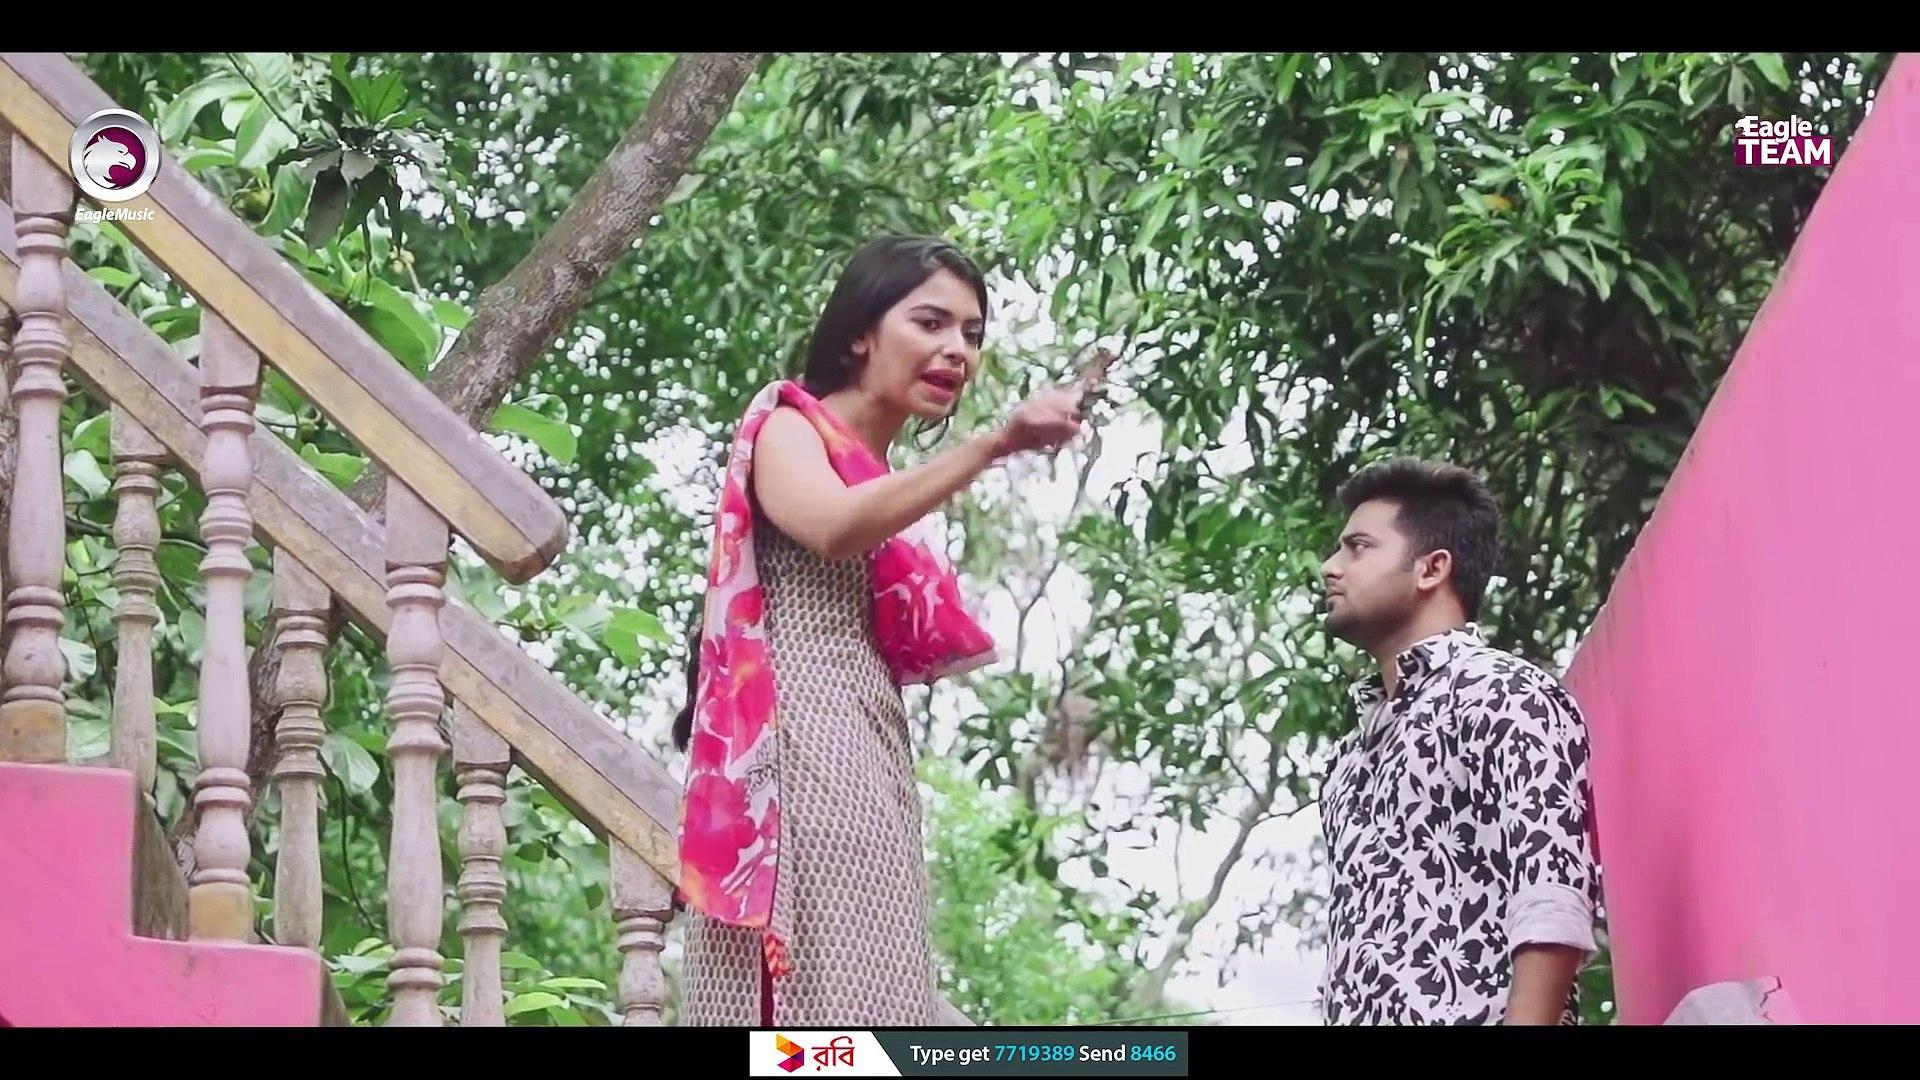 Oporadhi ¦ Ankur Mahamud Feat Arman Alif ¦ Bangla New Song 2018 ¦ Official  Video